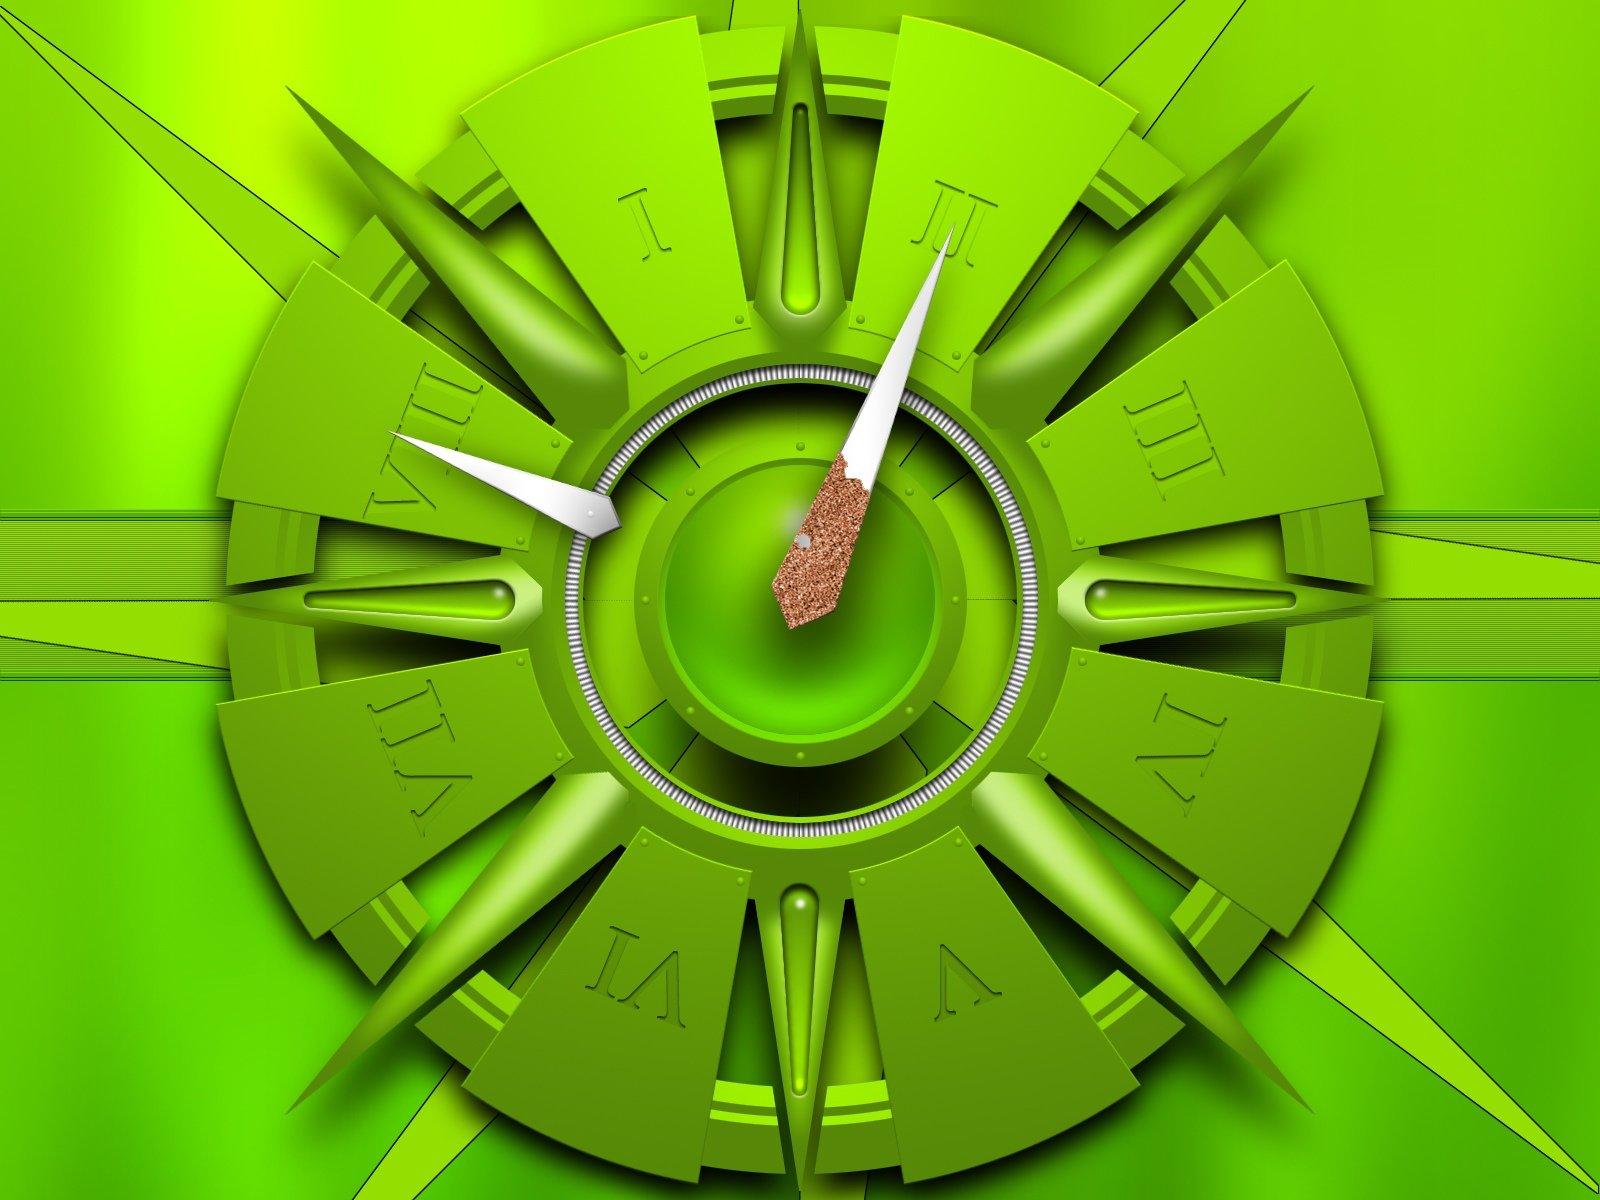 Desktop animated wallpapers mac os x lion download 1600x1200